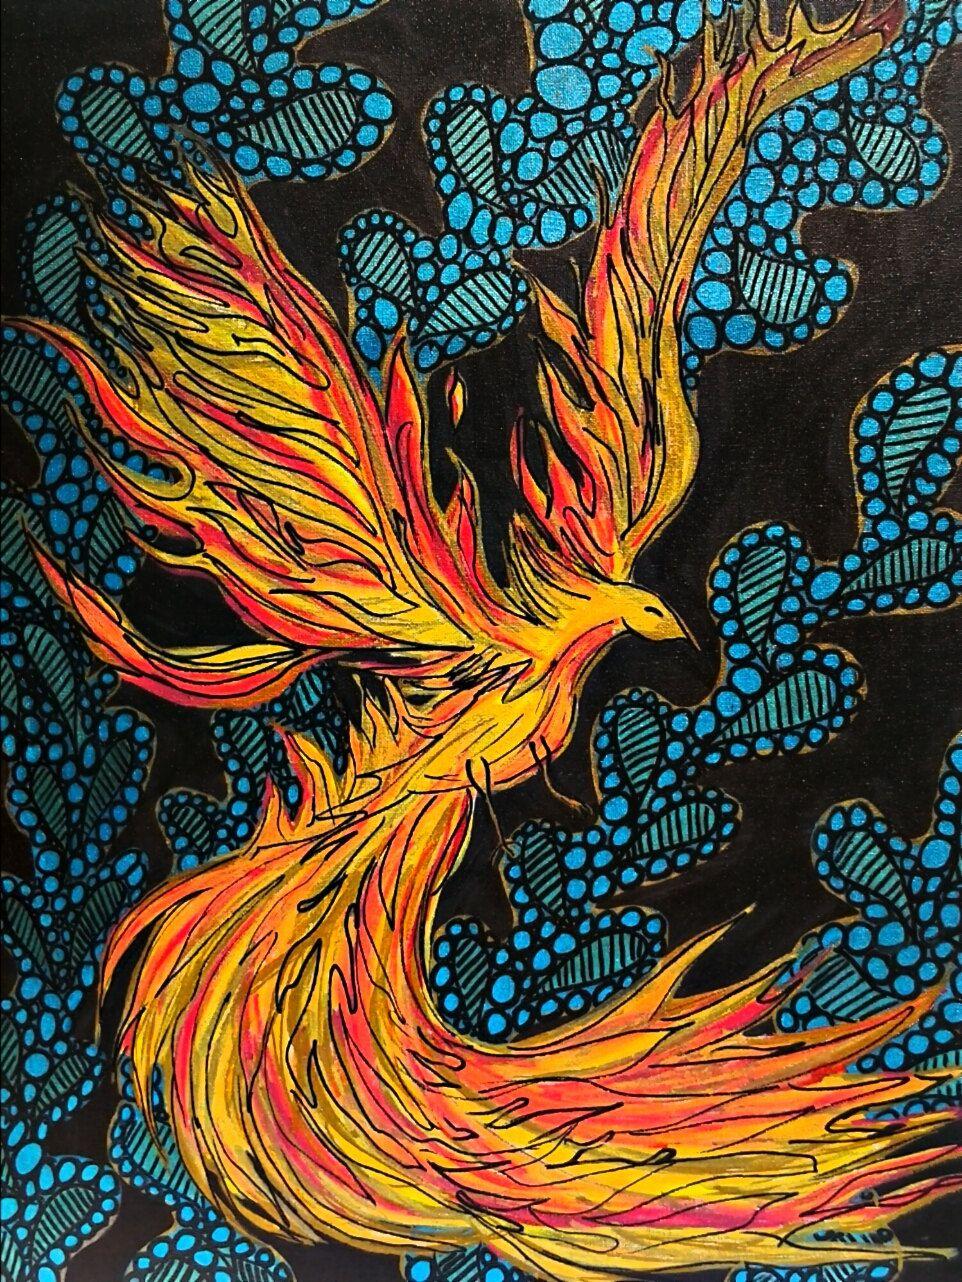 Original painting Phoenix fire bird on 18 x 24 by beccasboudoir. Original painting Phoenix fire bird on 18 x 24 by beccasboudoir